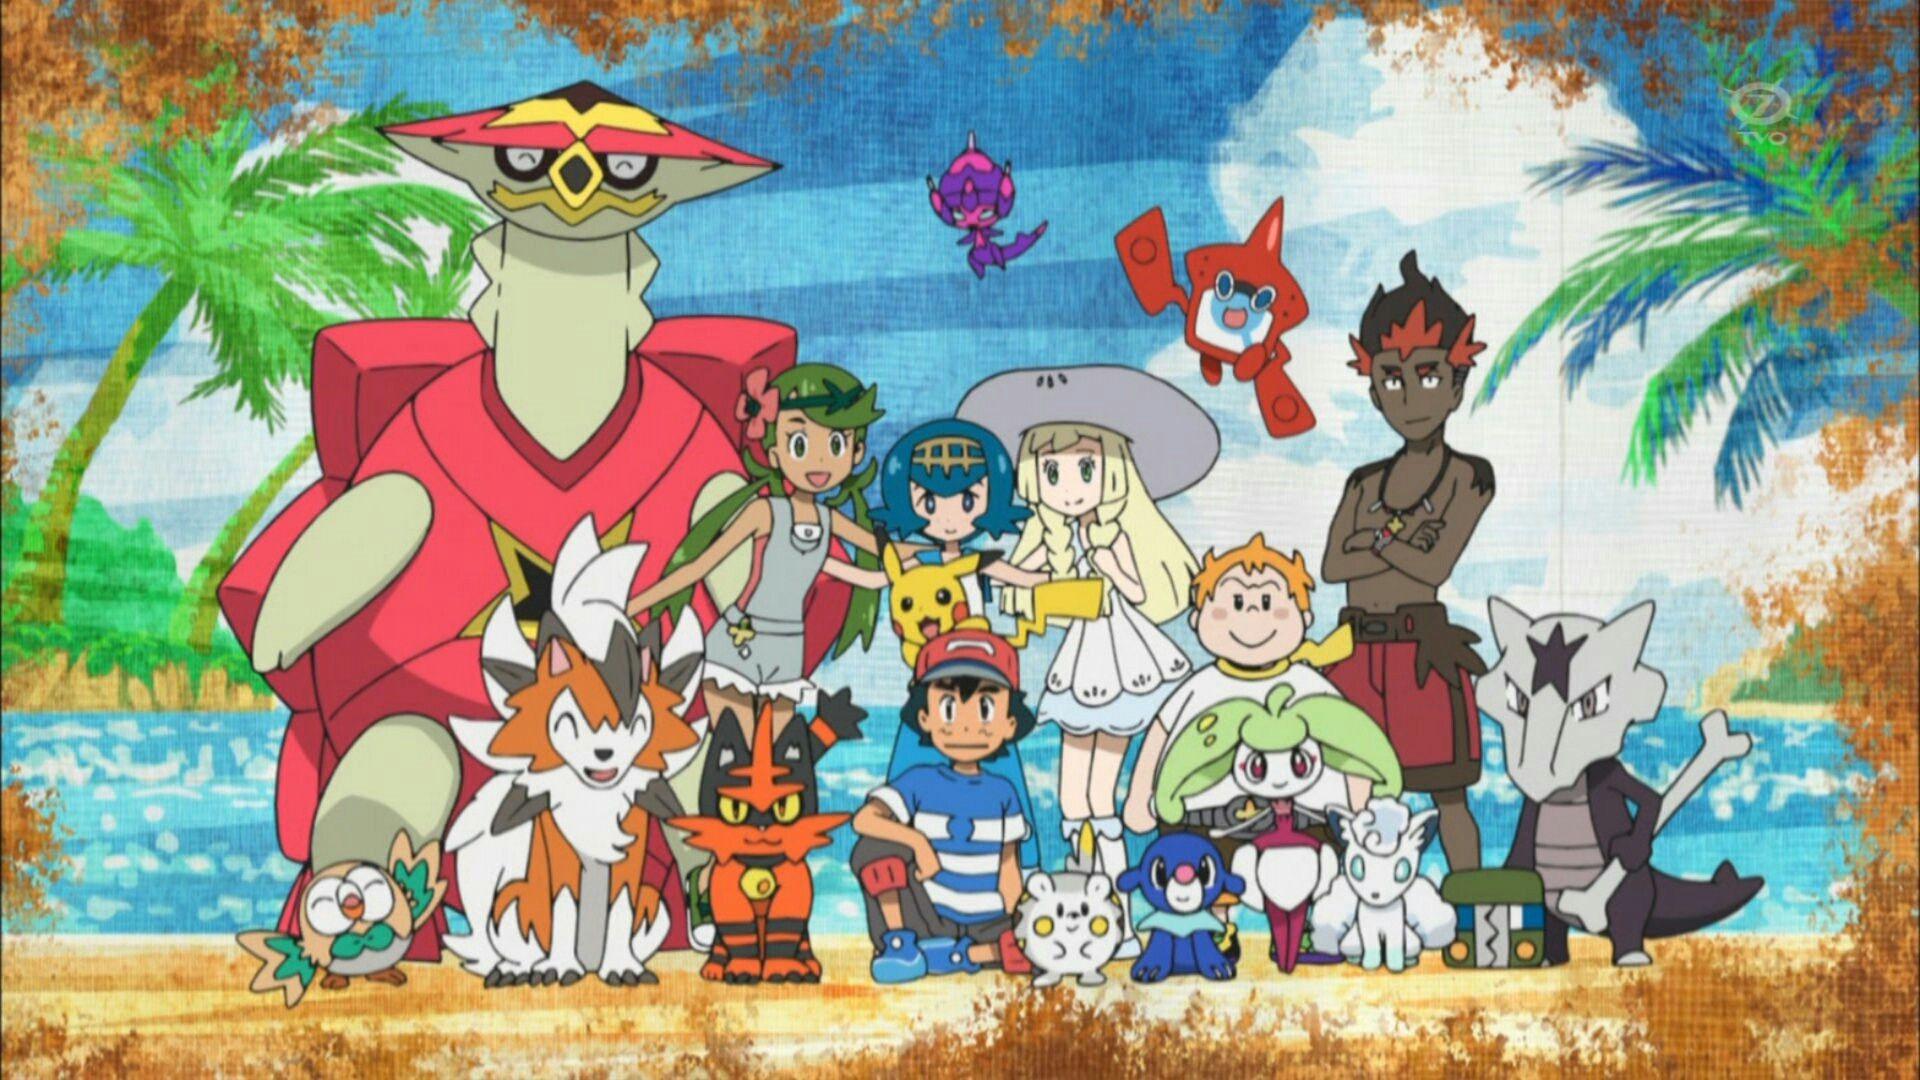 2c81d4128f14e8a784785059125552cf - How To Get Any Pokemon You Want In Pokemon Sun